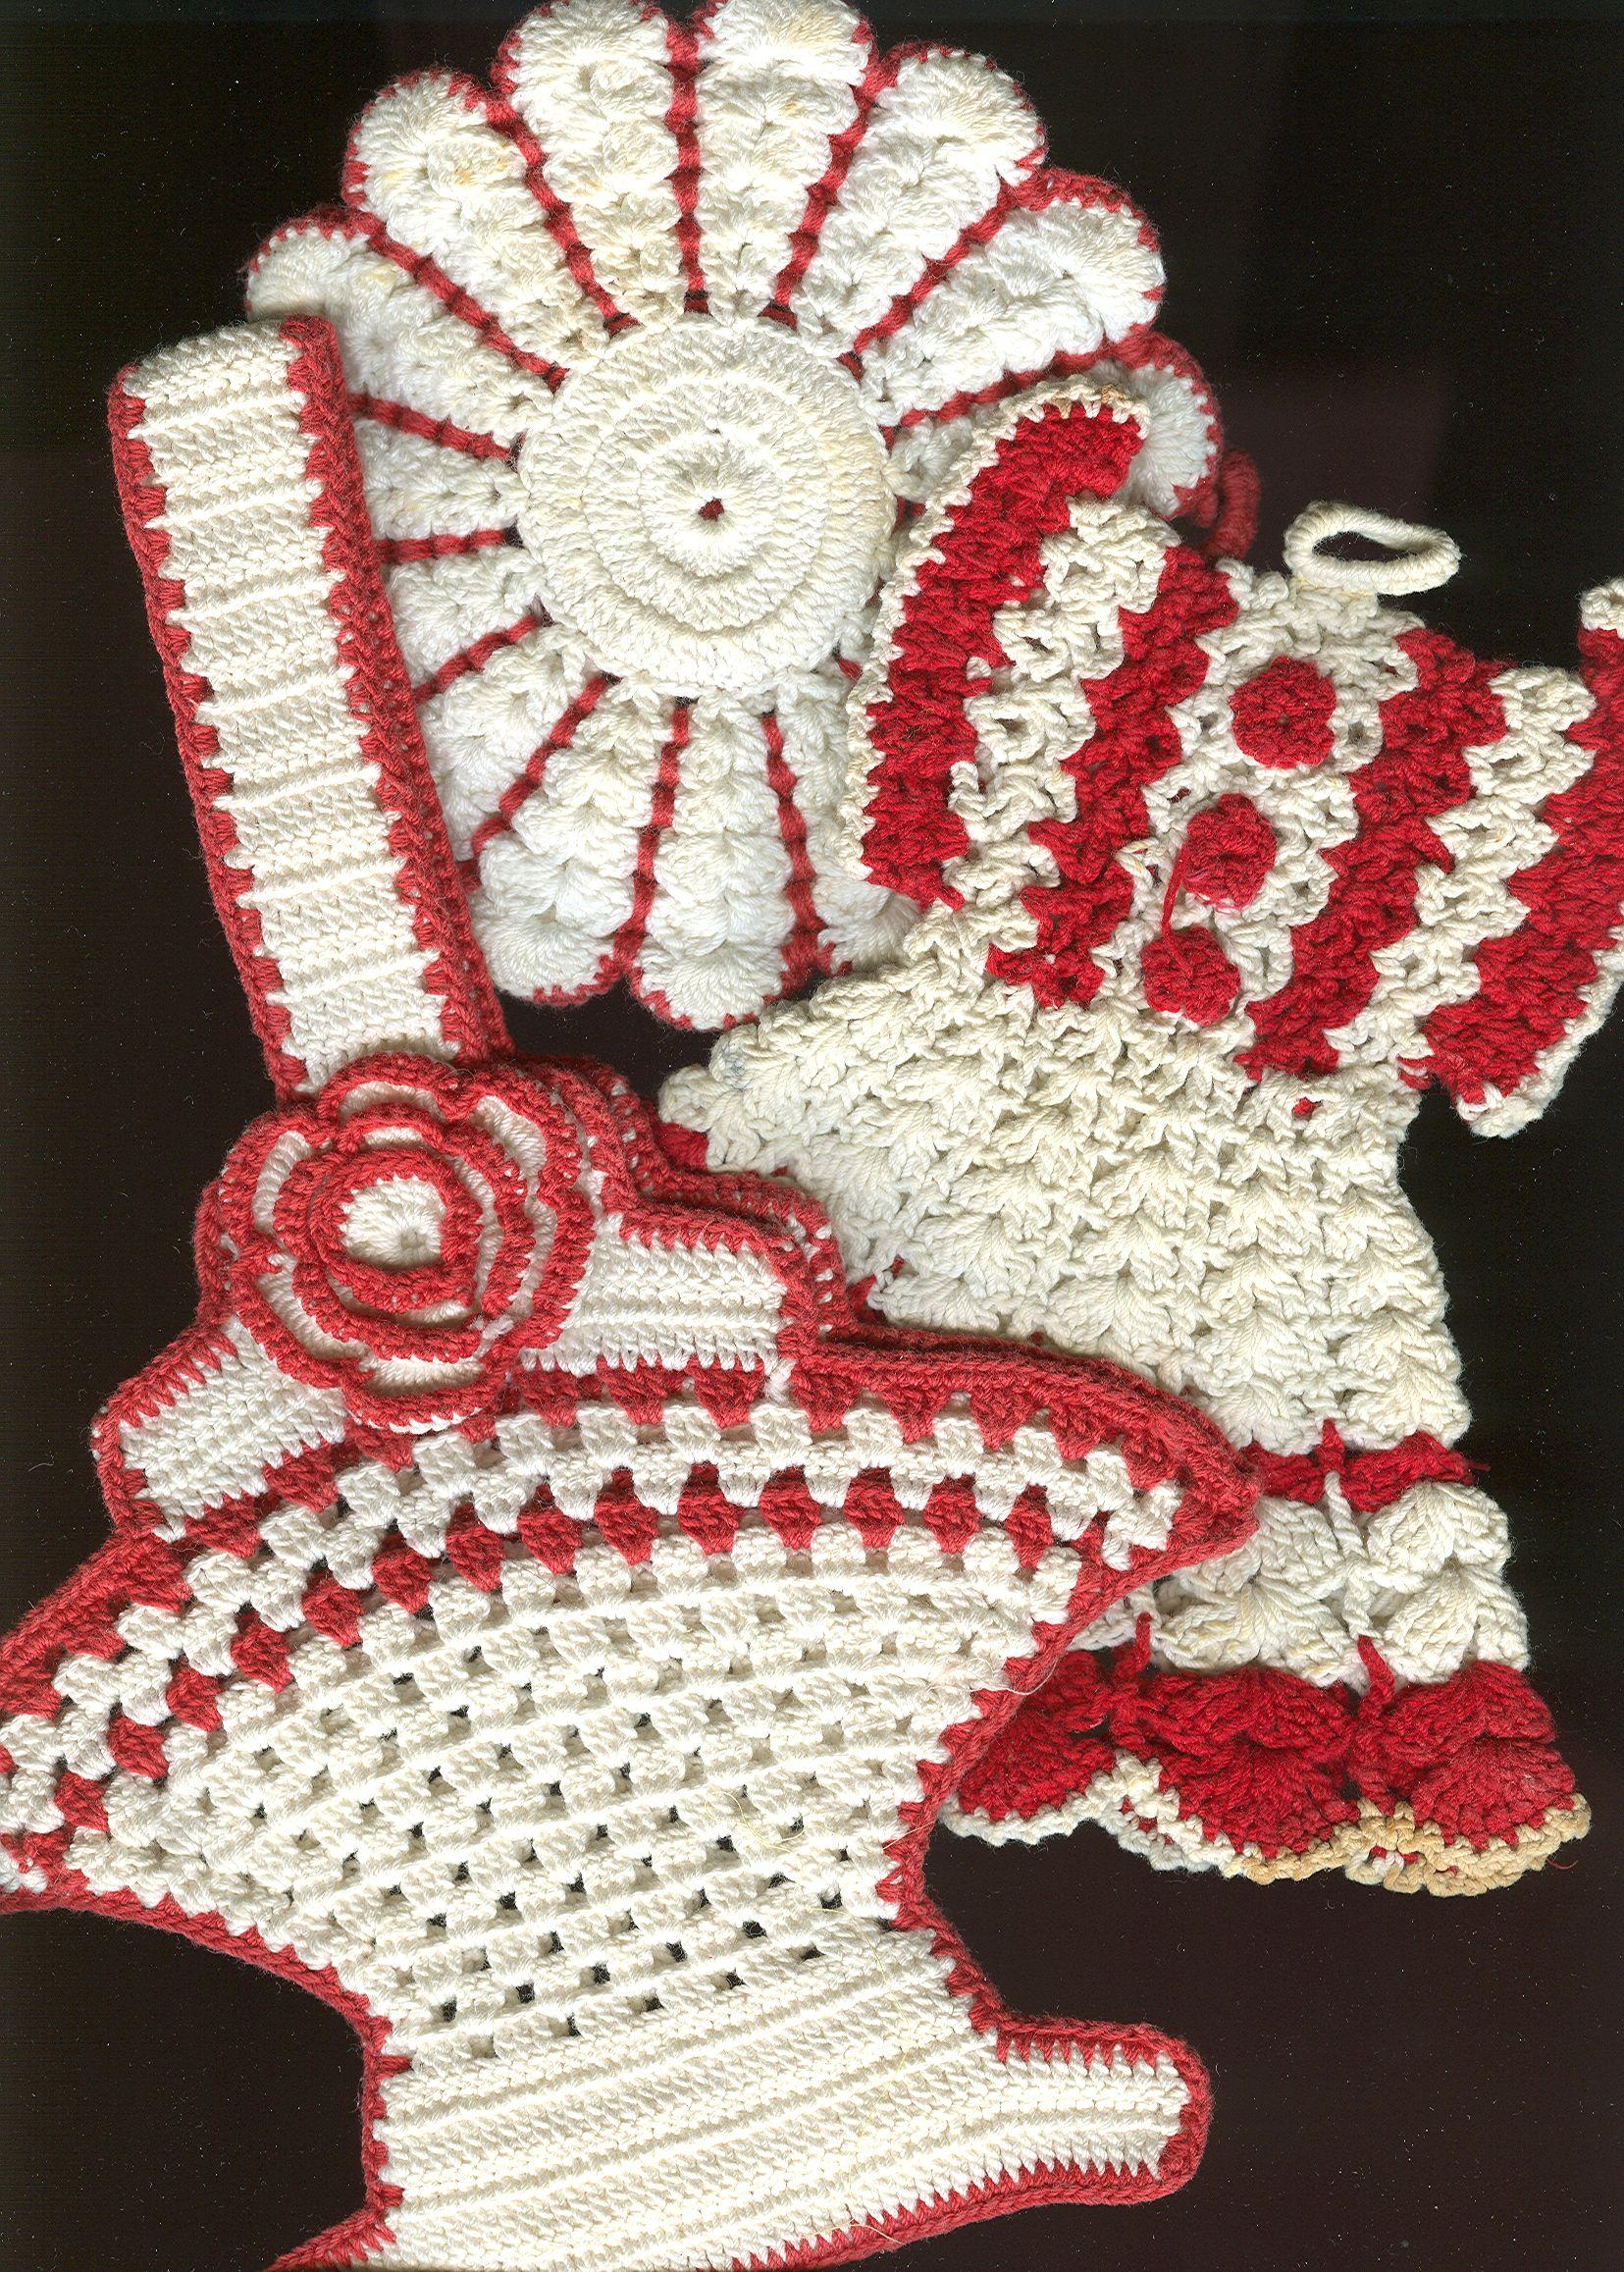 vintage crocheted hot pad holders vintage needlework linens hankies pinterest. Black Bedroom Furniture Sets. Home Design Ideas